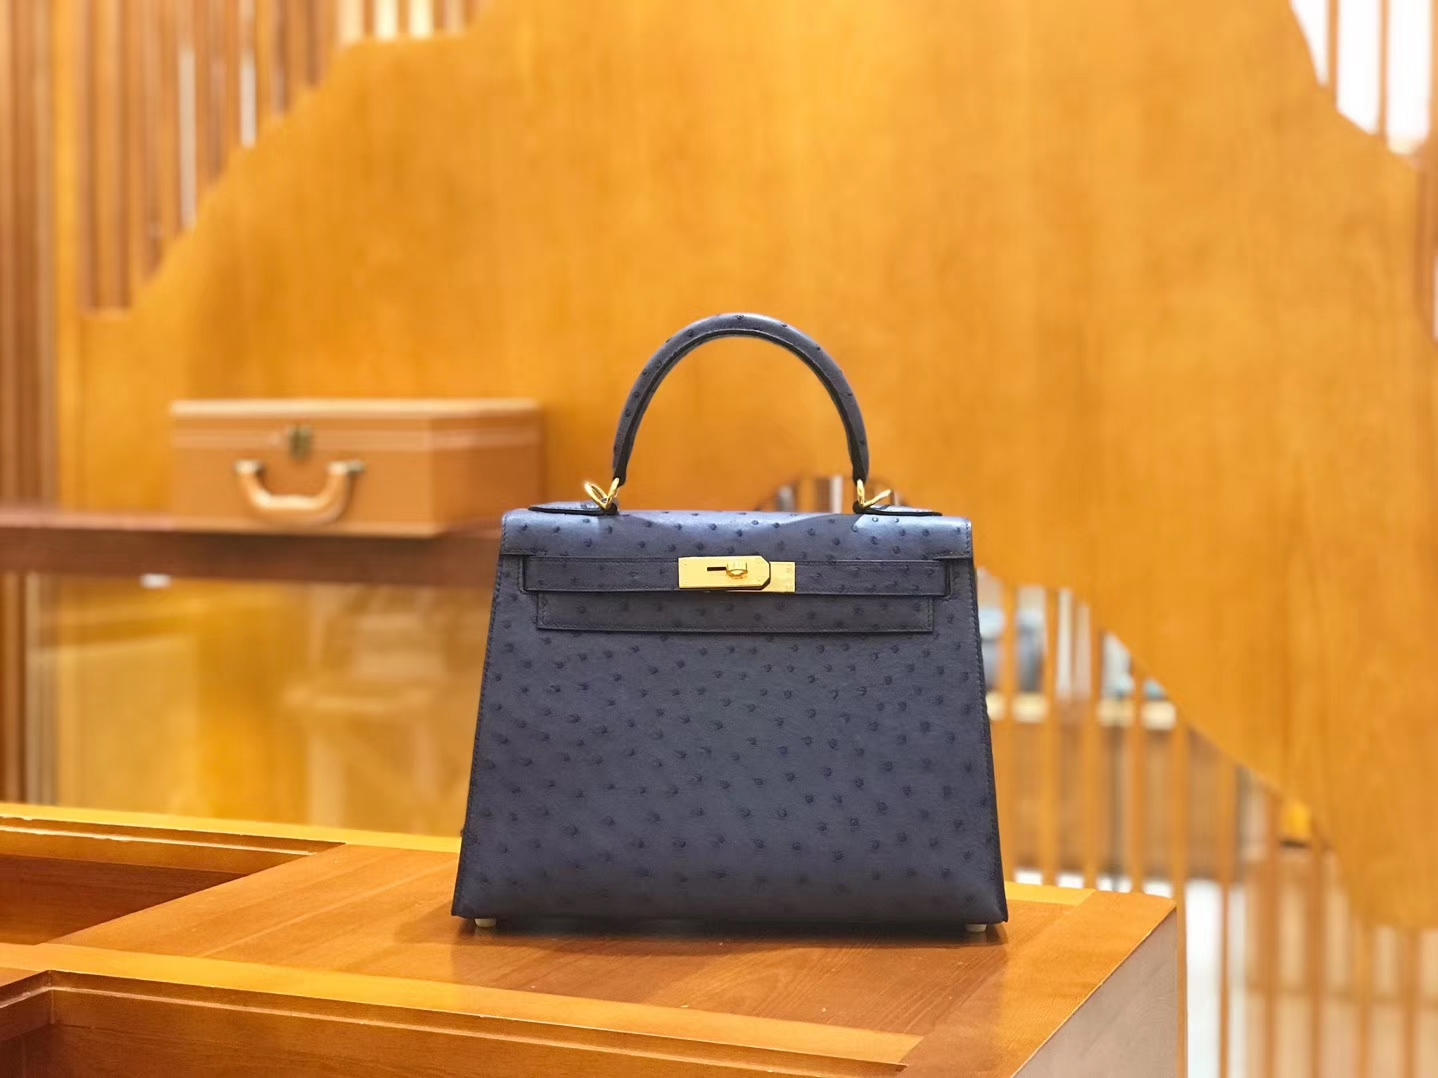 Hermès(爱马仕)Kelly 28cm 鸵鸟皮 玛瑙蓝 全手工缝制 新增现货